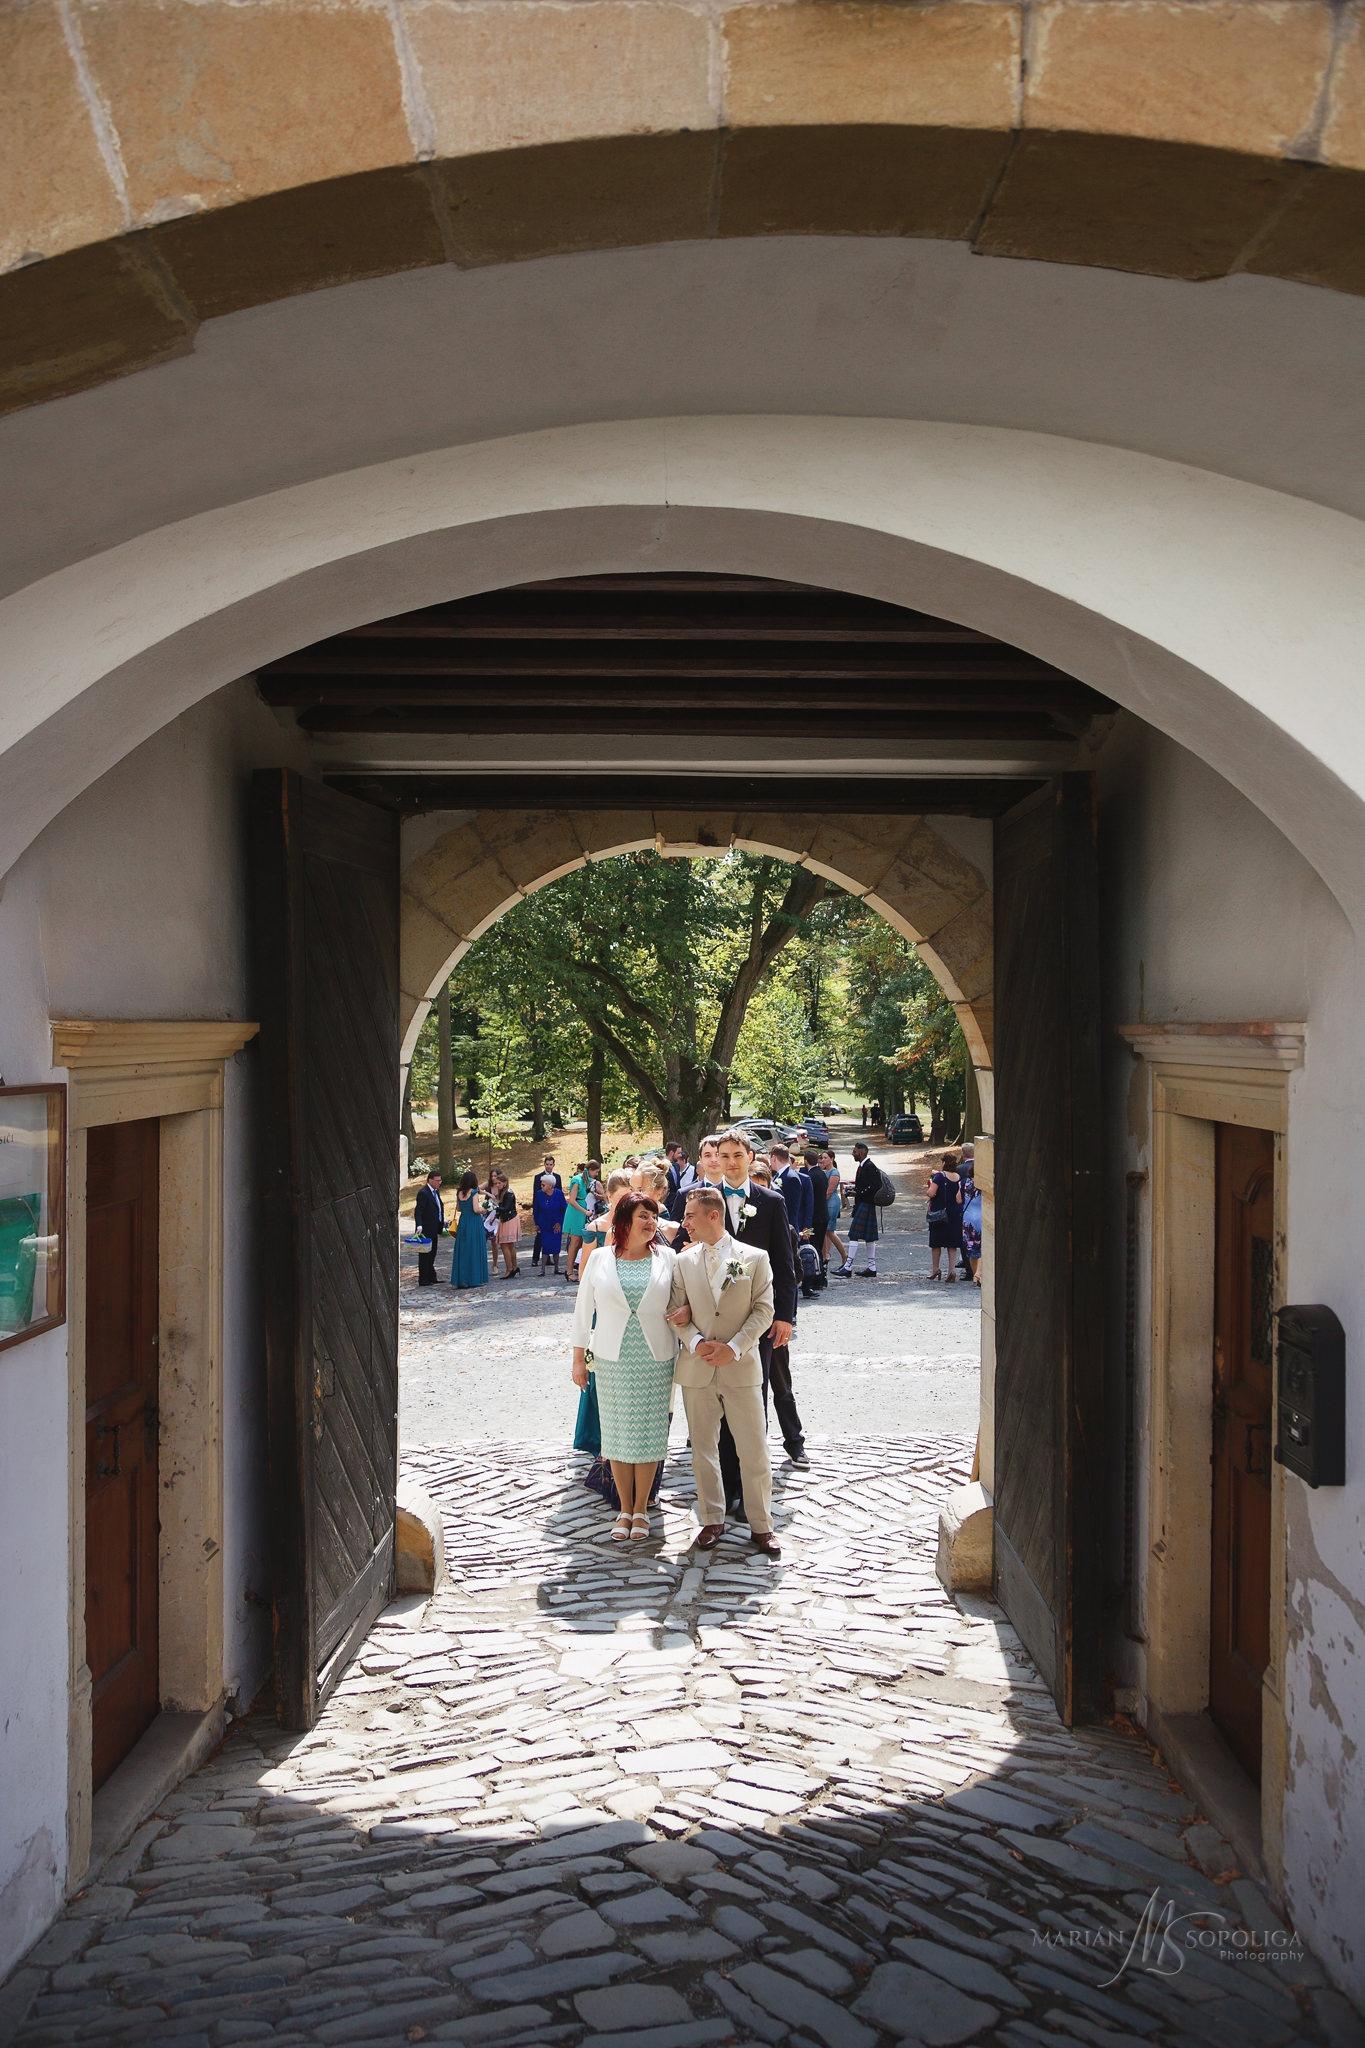 11reportazni-svatebni-fotografie-hrad-bouzov-pred-svatebnim-obra